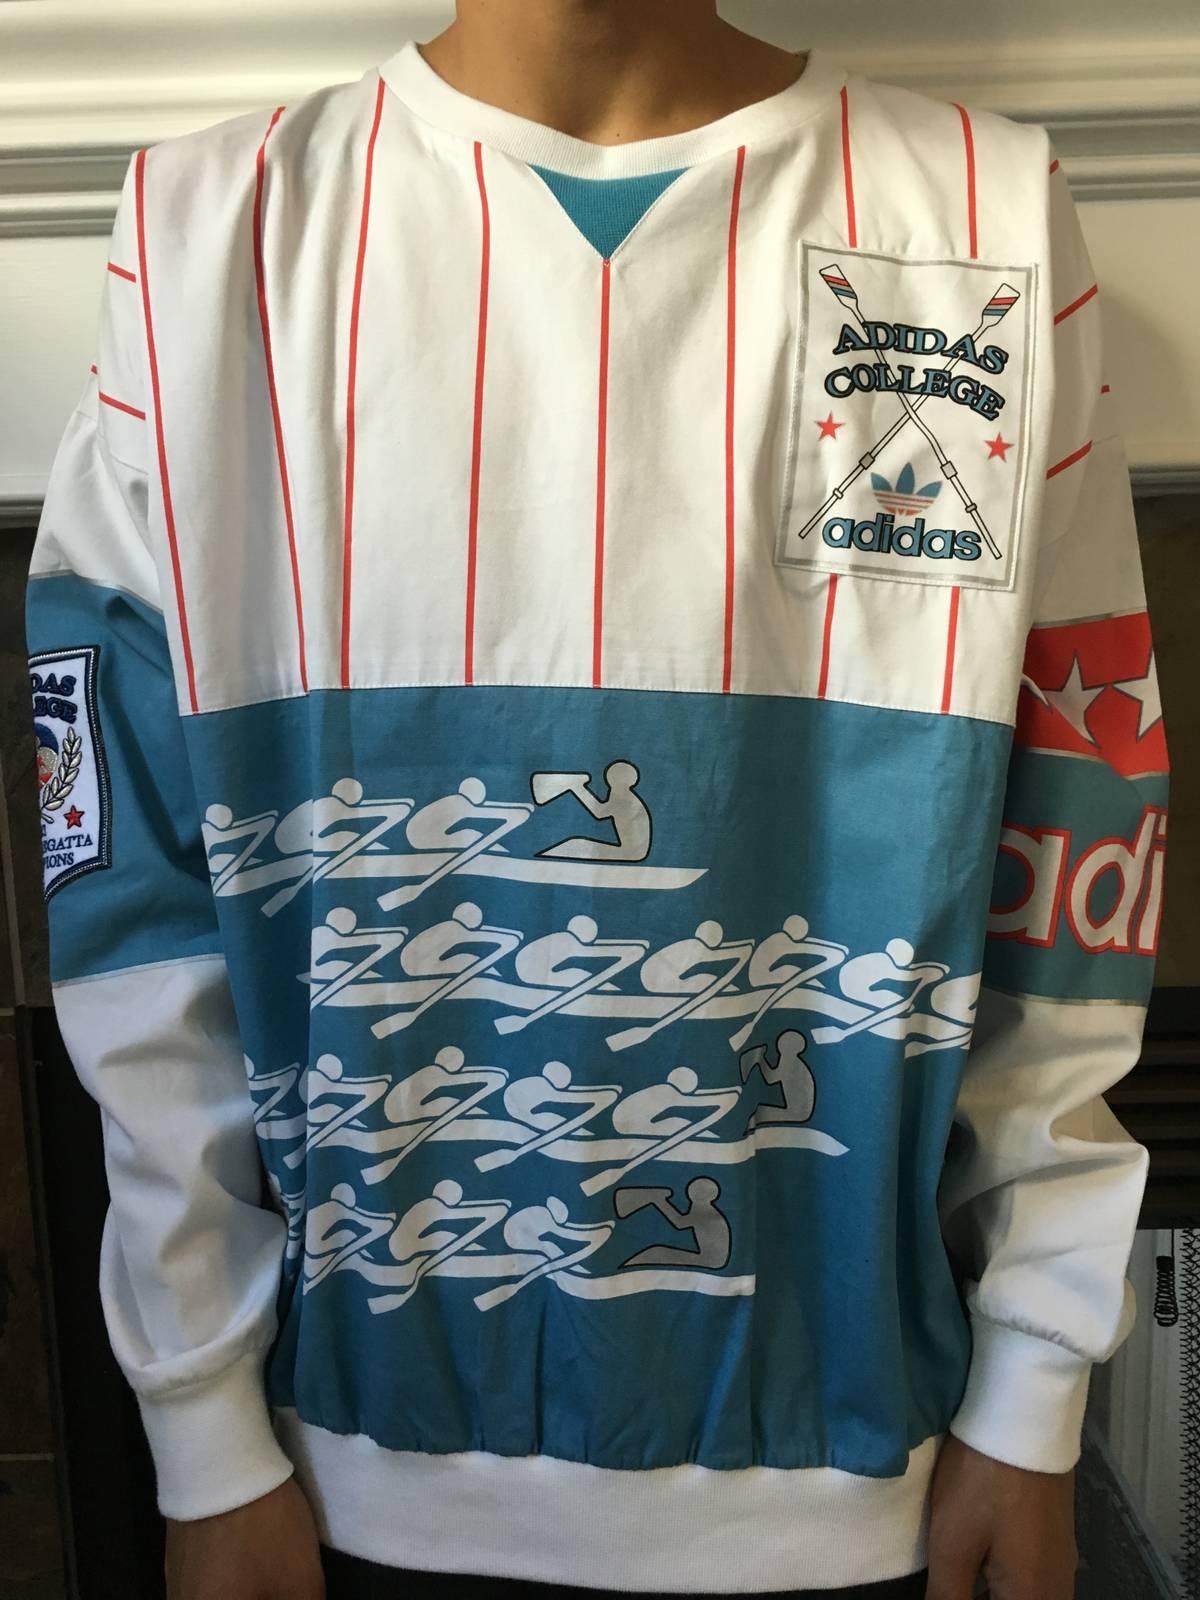 29252775eb111f Adidas ADIDAS Official Retro SAMPLE College 1921 Regatta crewneck Size m -  Long Sleeve T-Shirts for Sale - Grailed